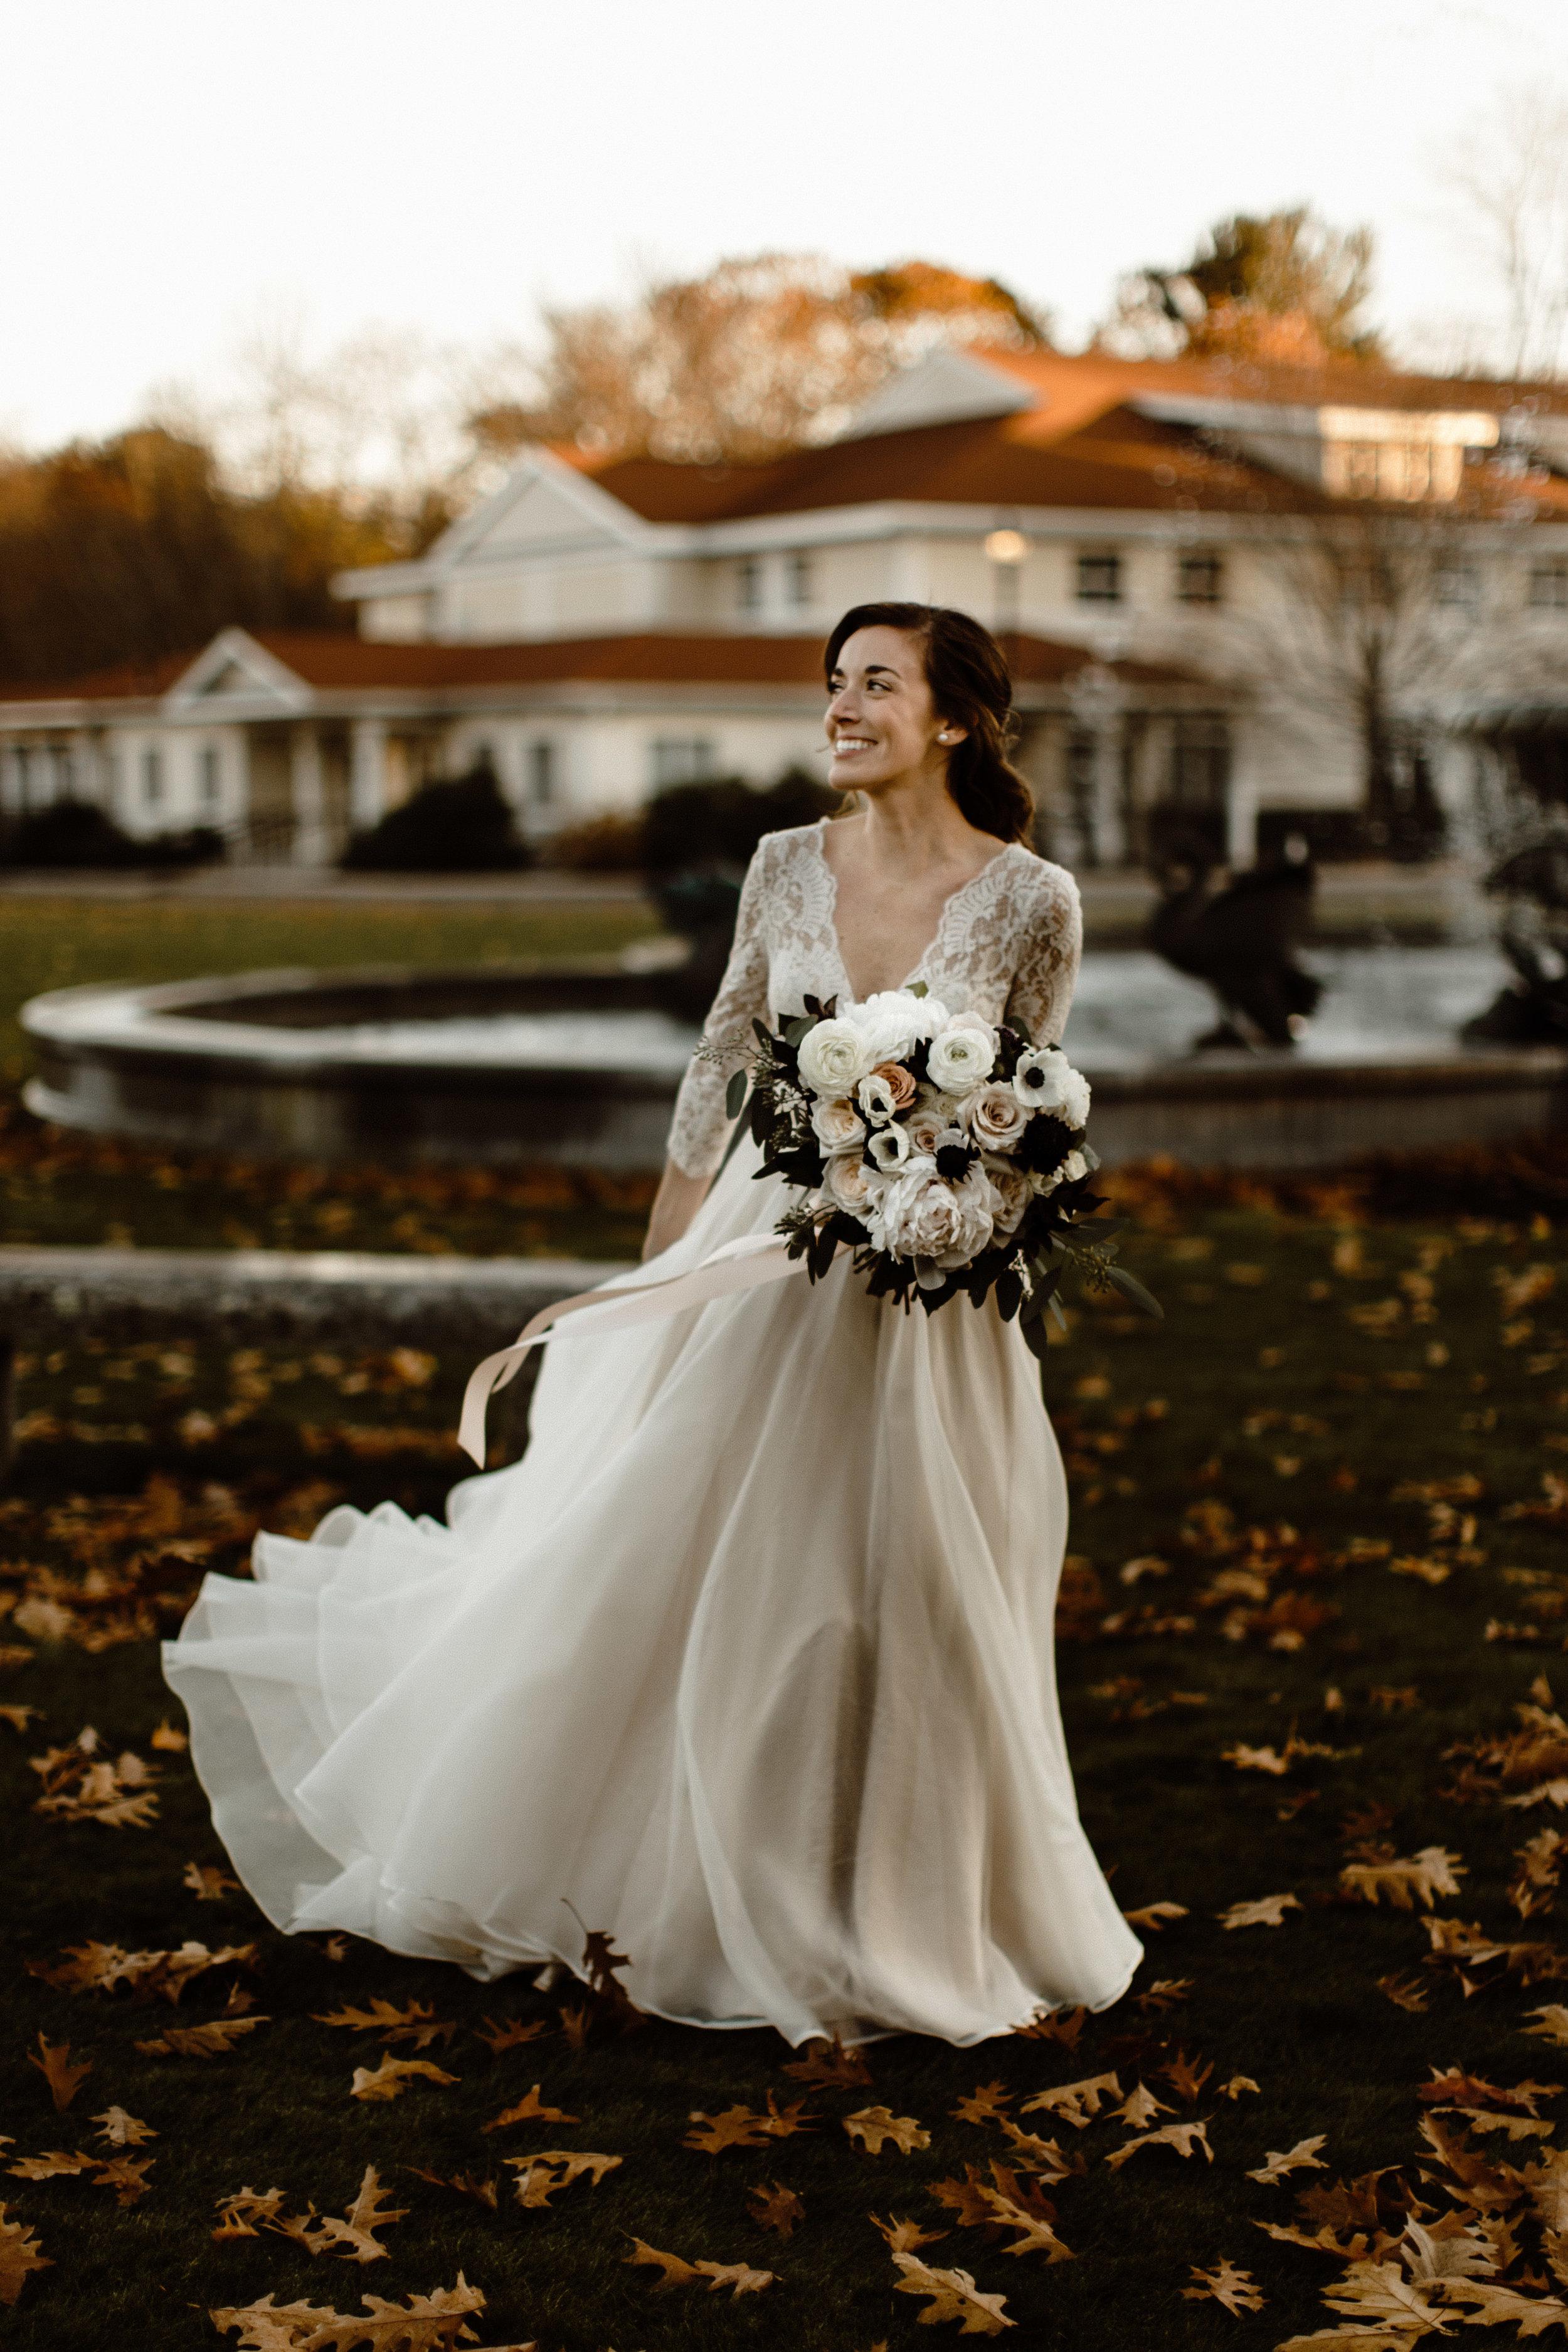 beverly_ma_wedding-32.jpg